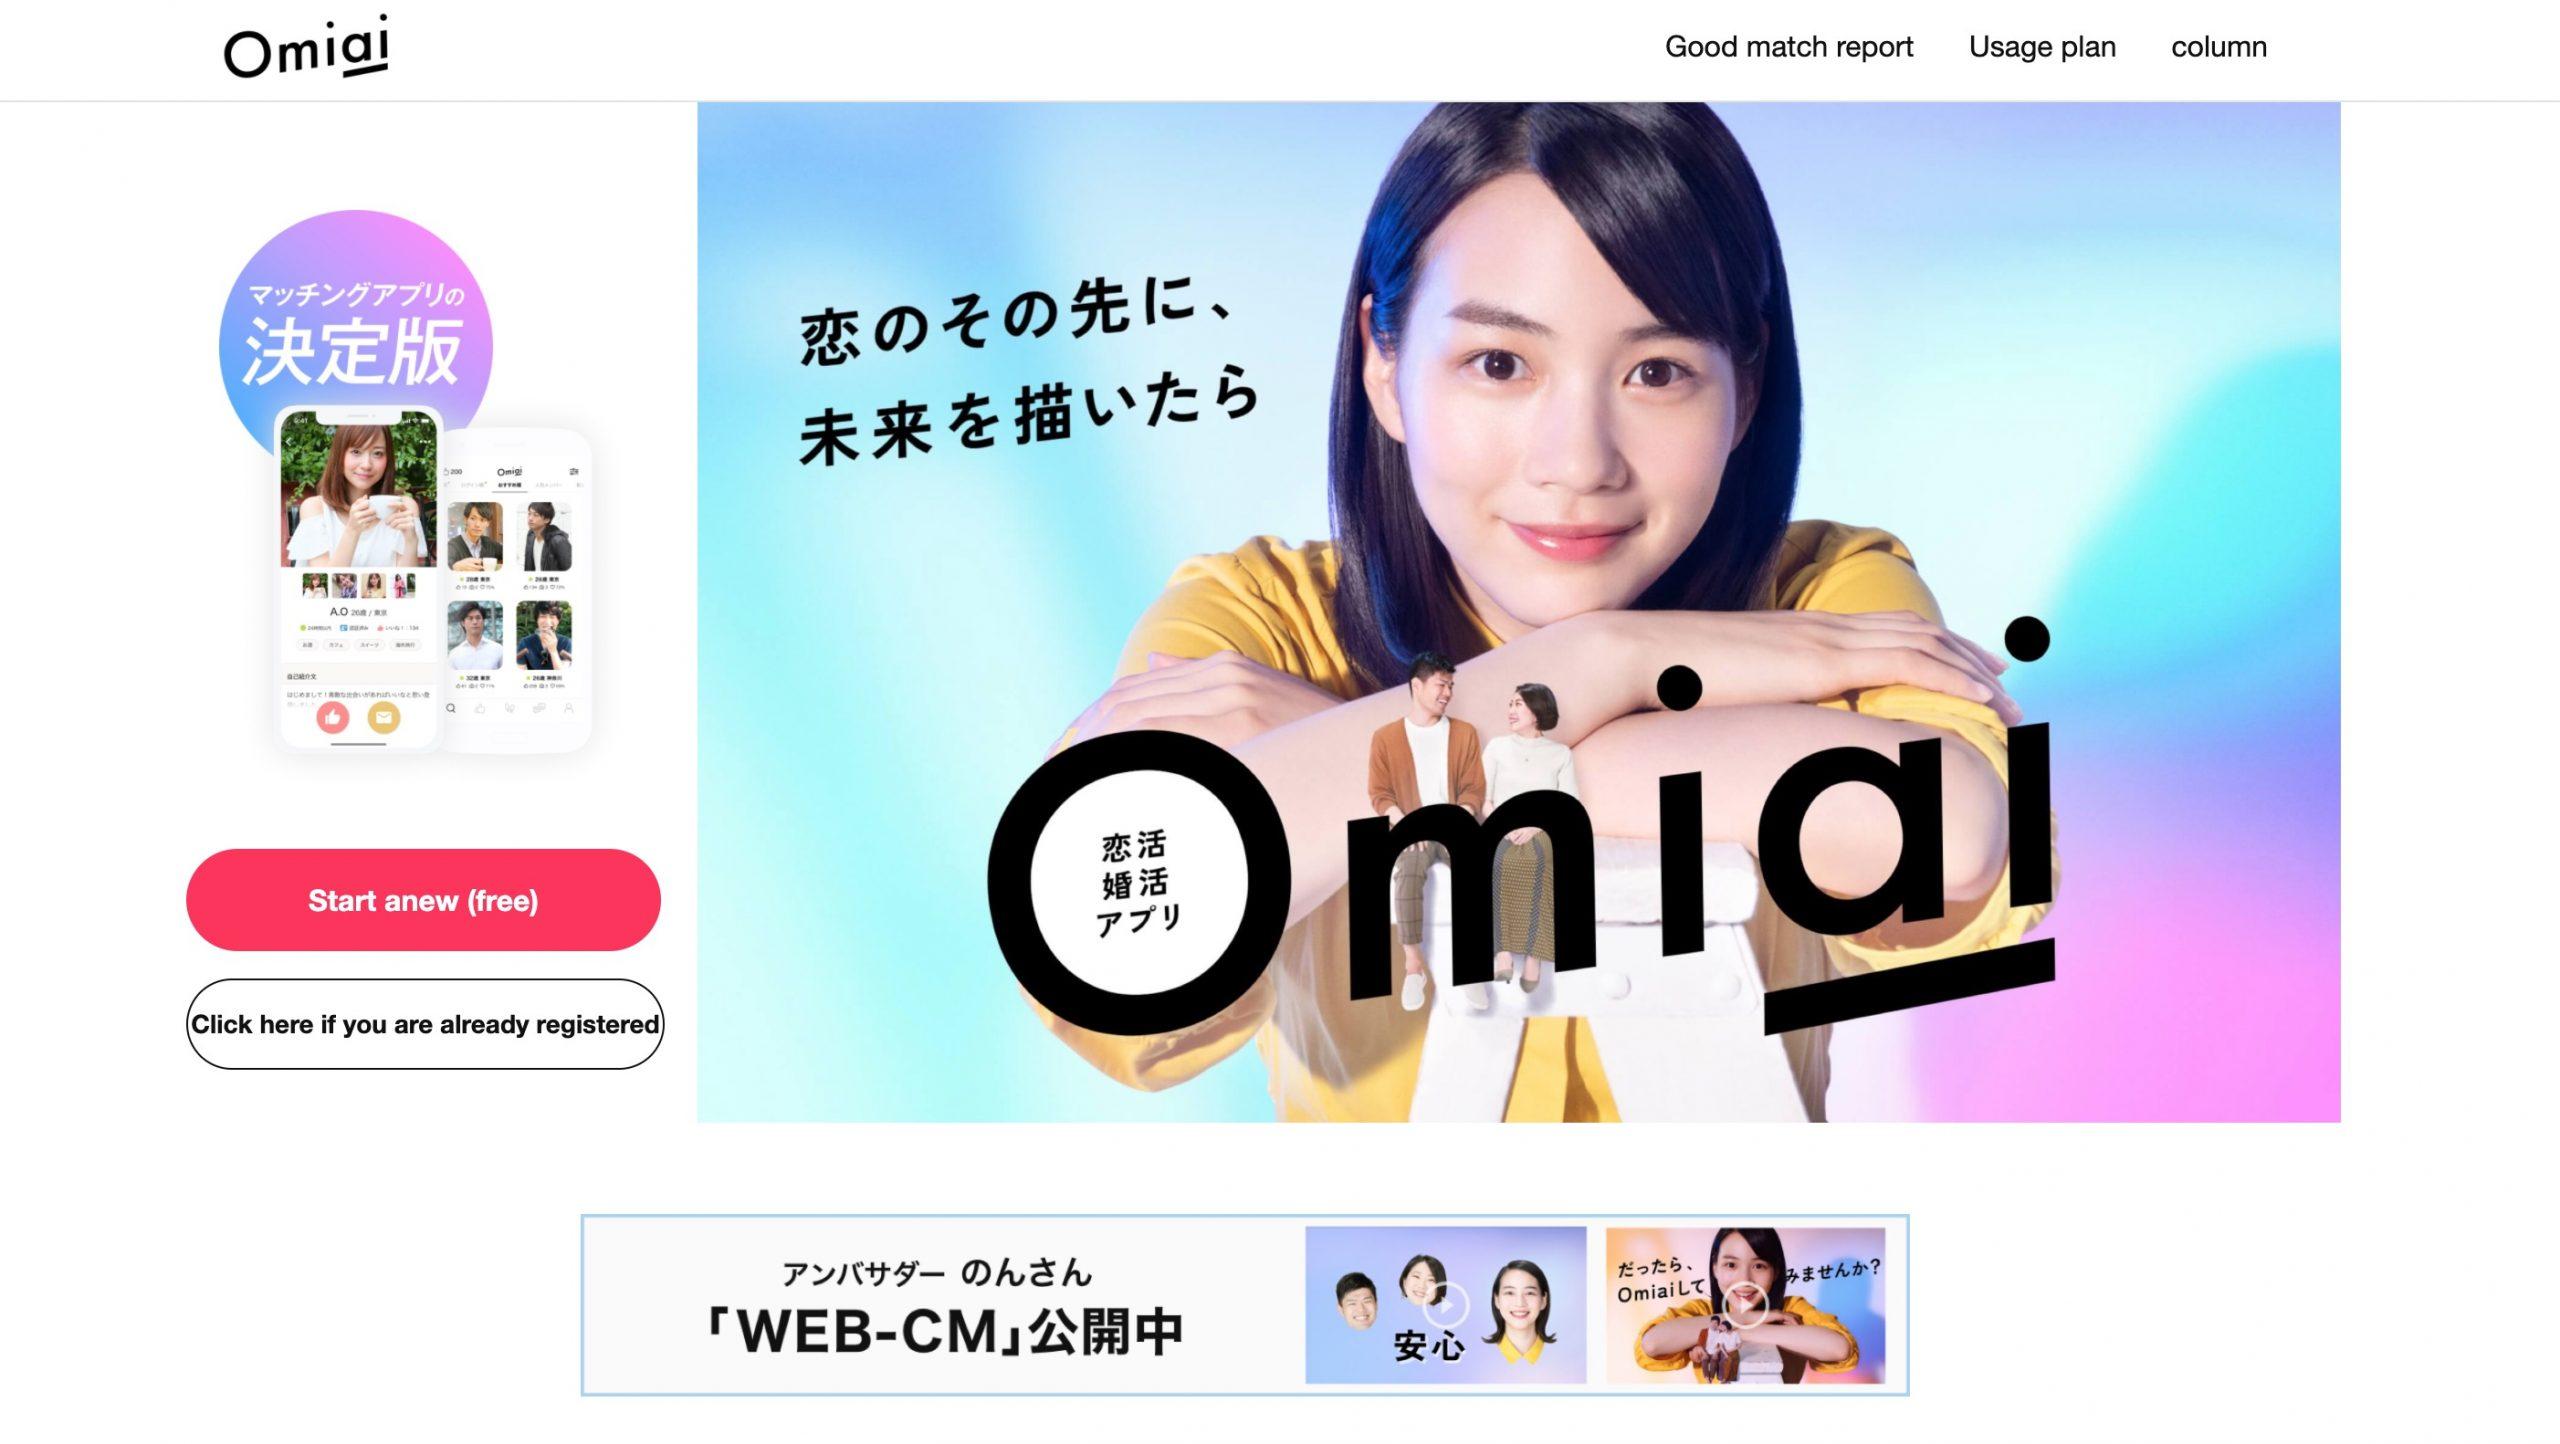 Omiai main page